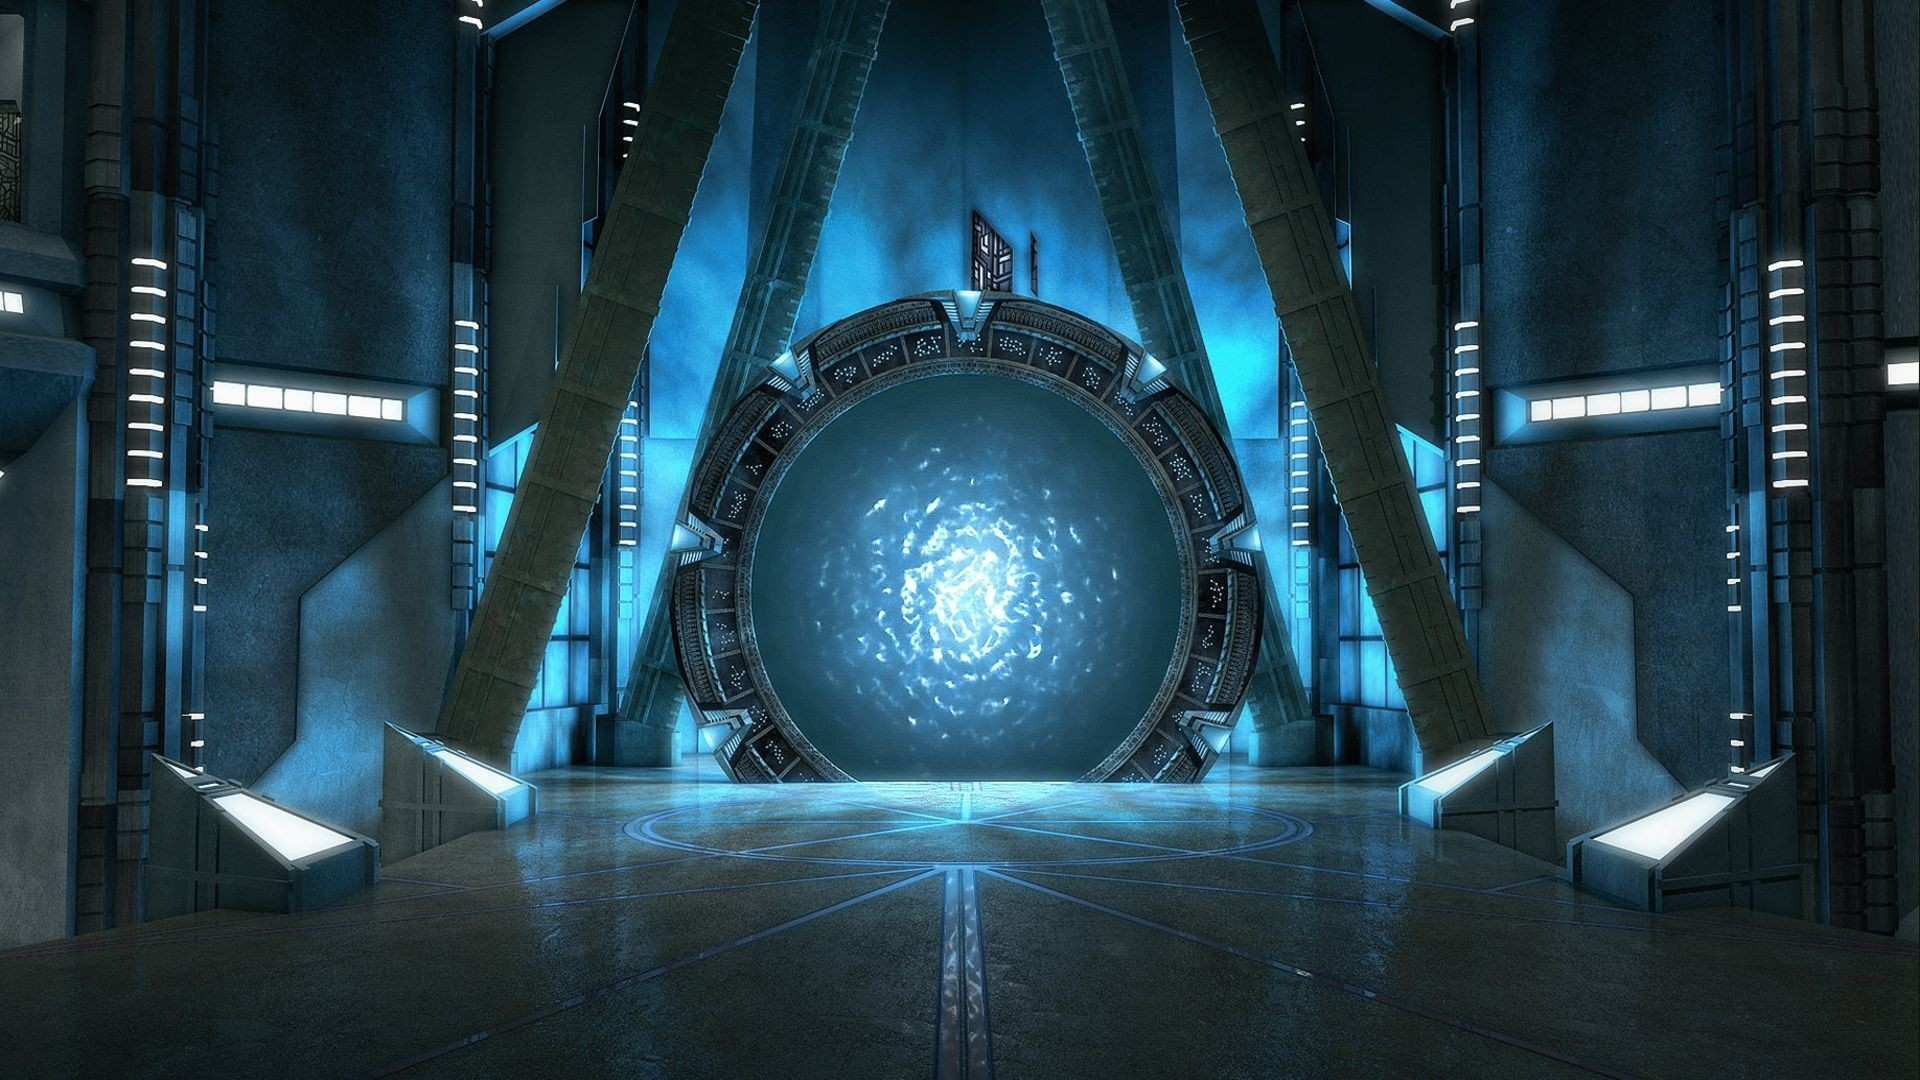 Stargate: The Movie Reboot Has Fallen Apart | Unpause Asia